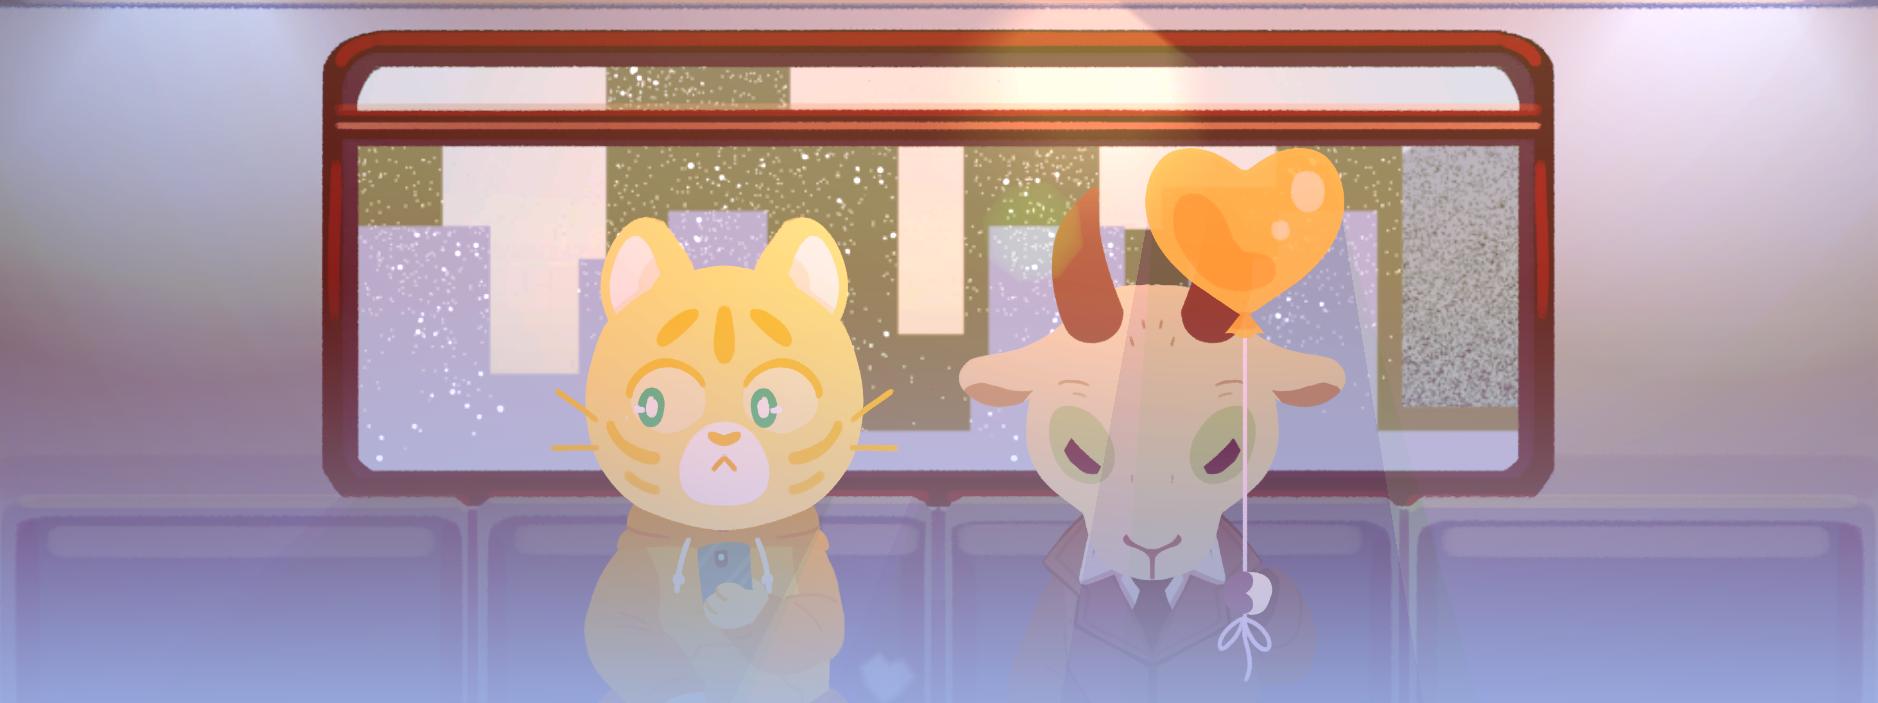 Midnight Train: Going Anywhere